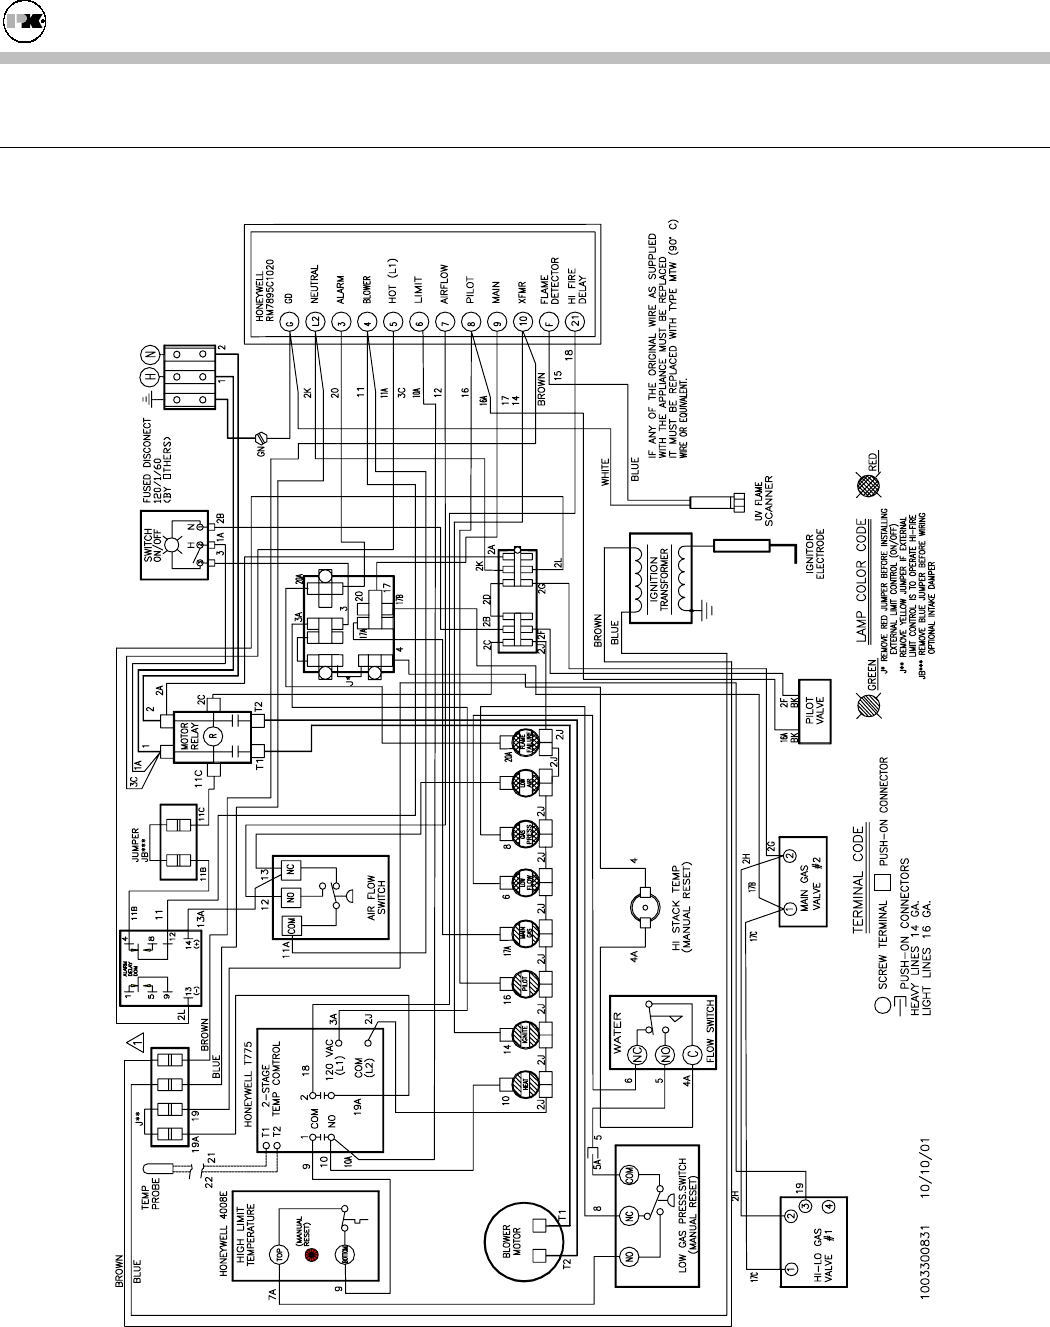 patterson kelley dvscm 02 users manual dvscm02